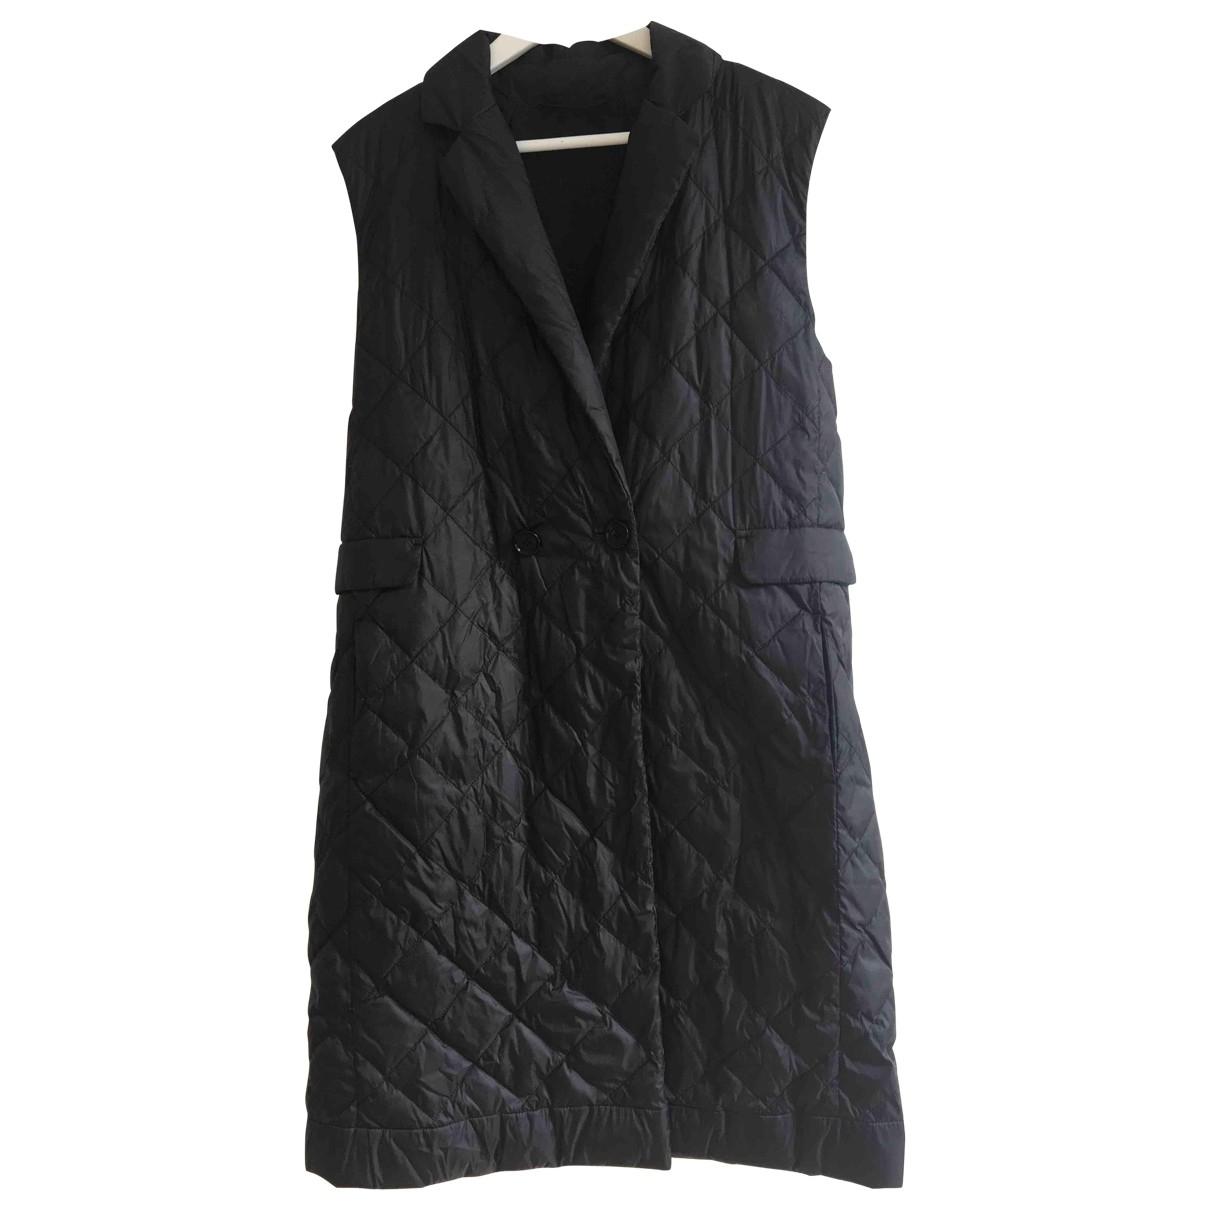 Max Mara \N Black jacket for Women 44 IT